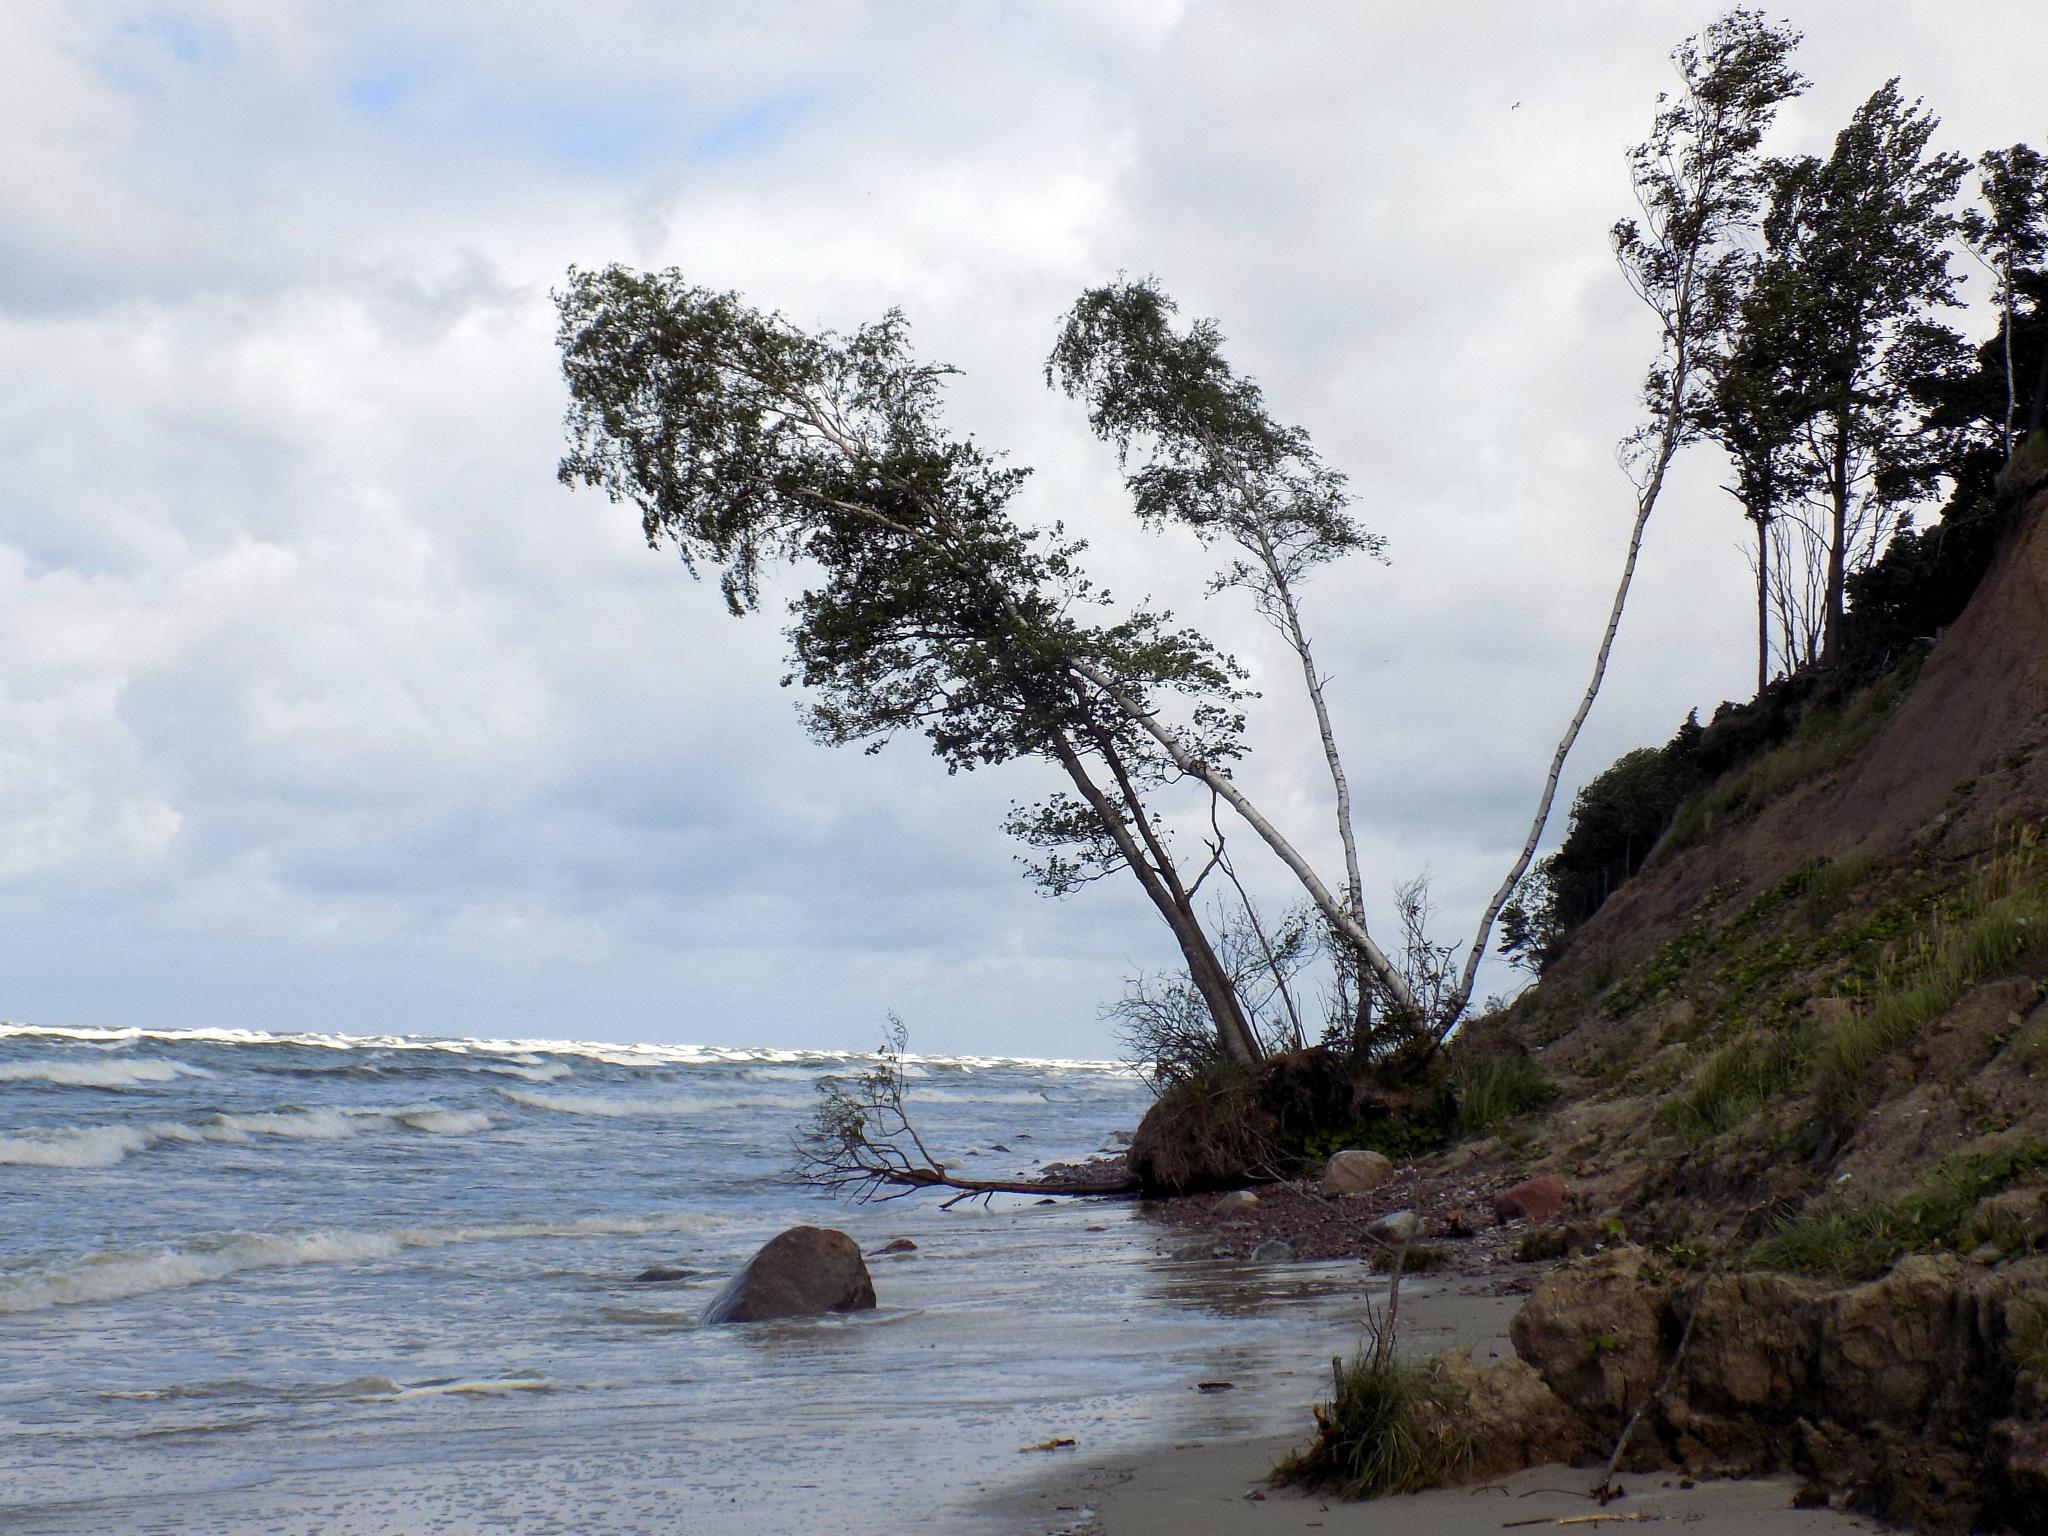 Tres on the seashore by uzkuraitiene62